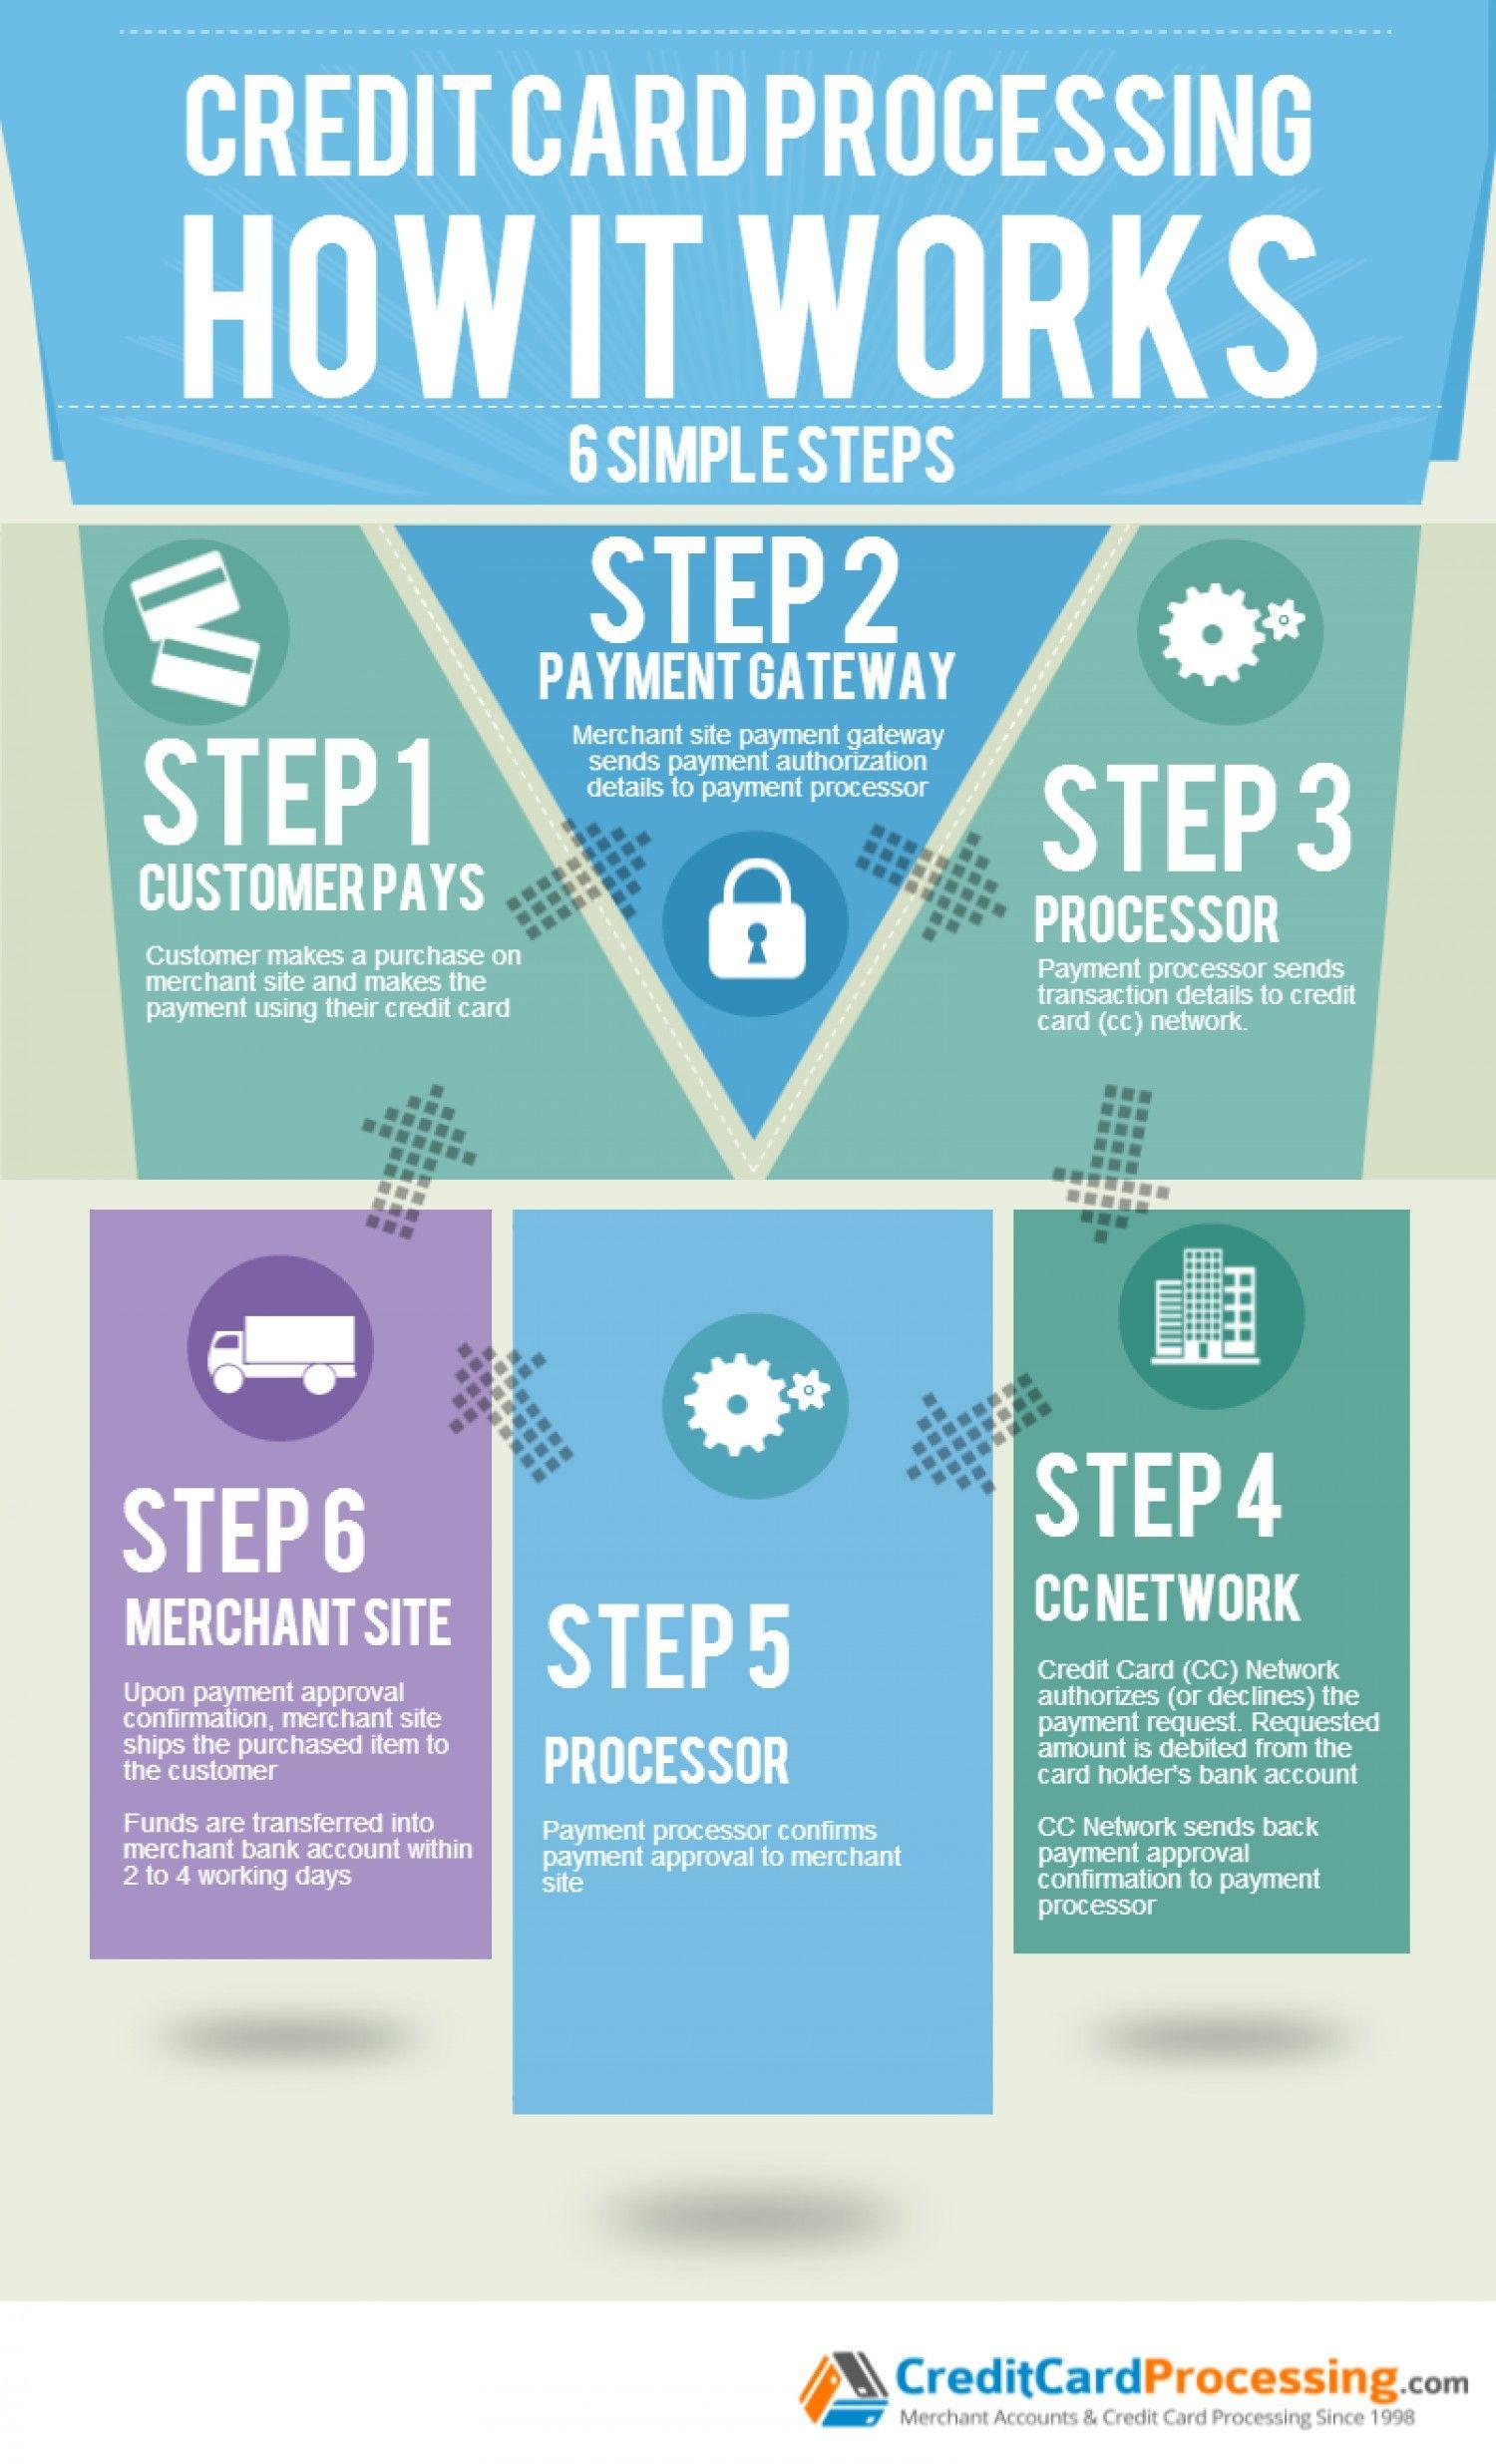 merchant card account keyword processing credit Adult